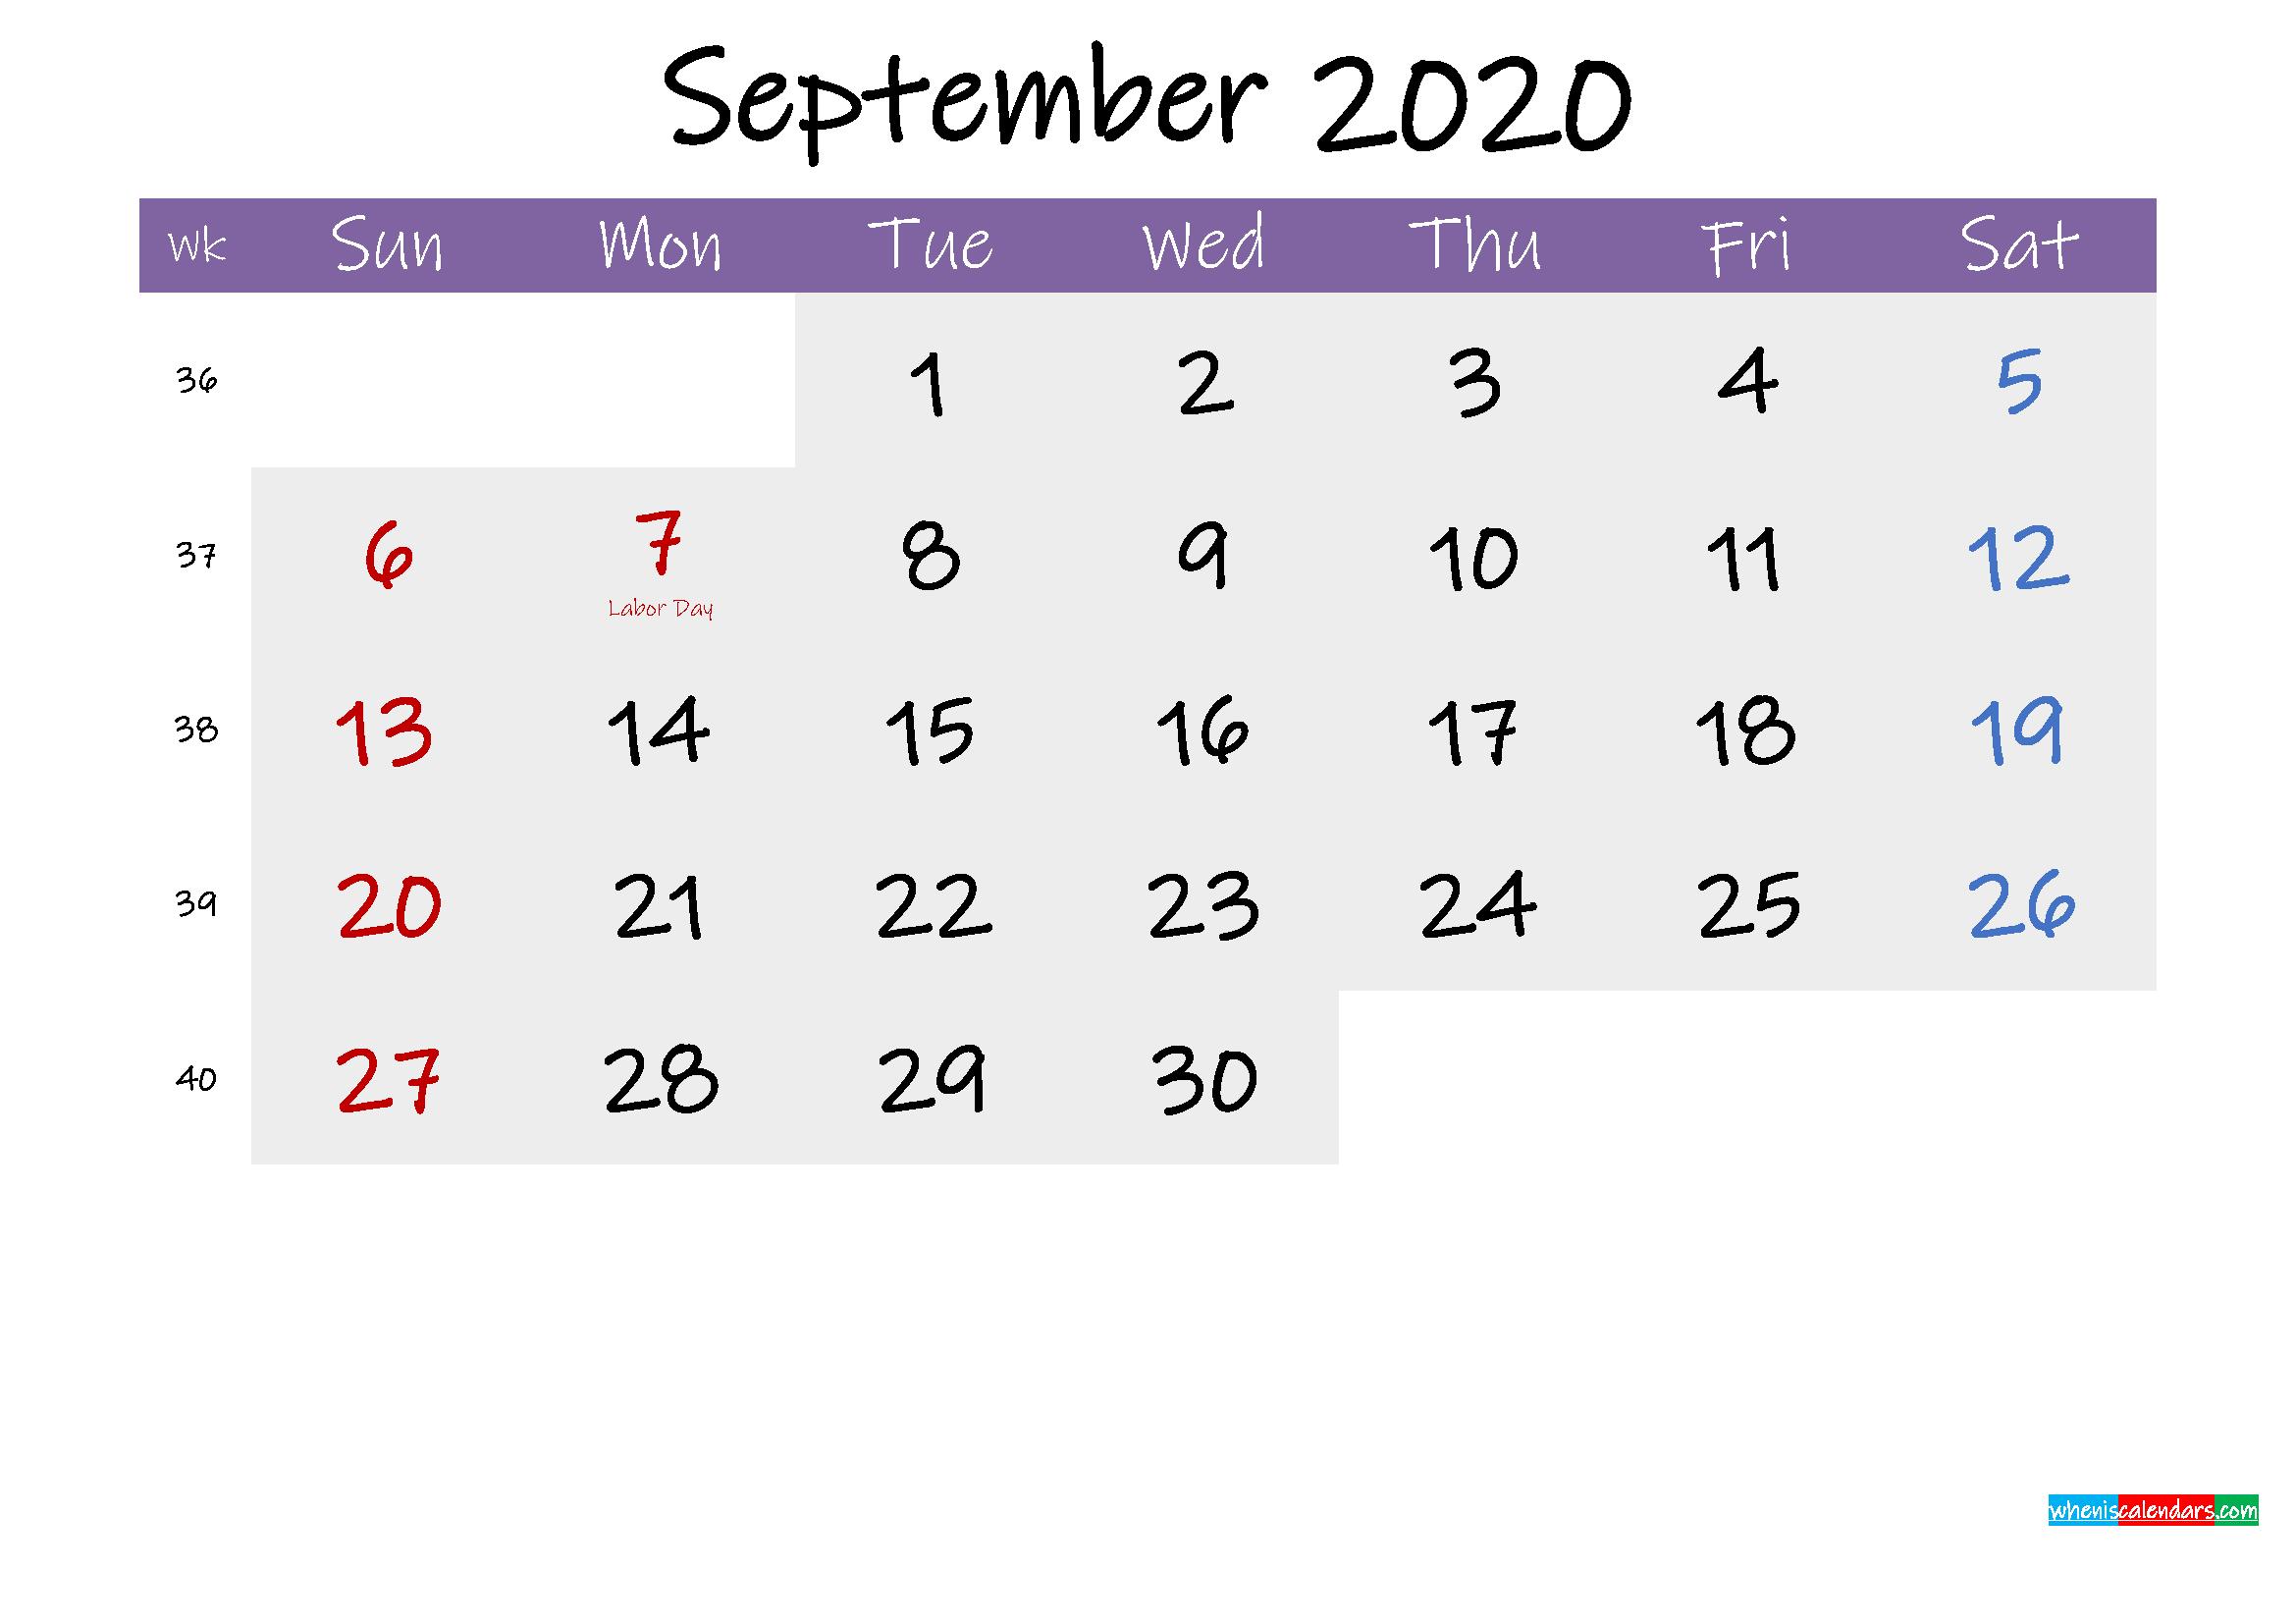 View Free Printable Editable Microsoft Word Free Printable Editable Printable Calendar September 2020 JPG